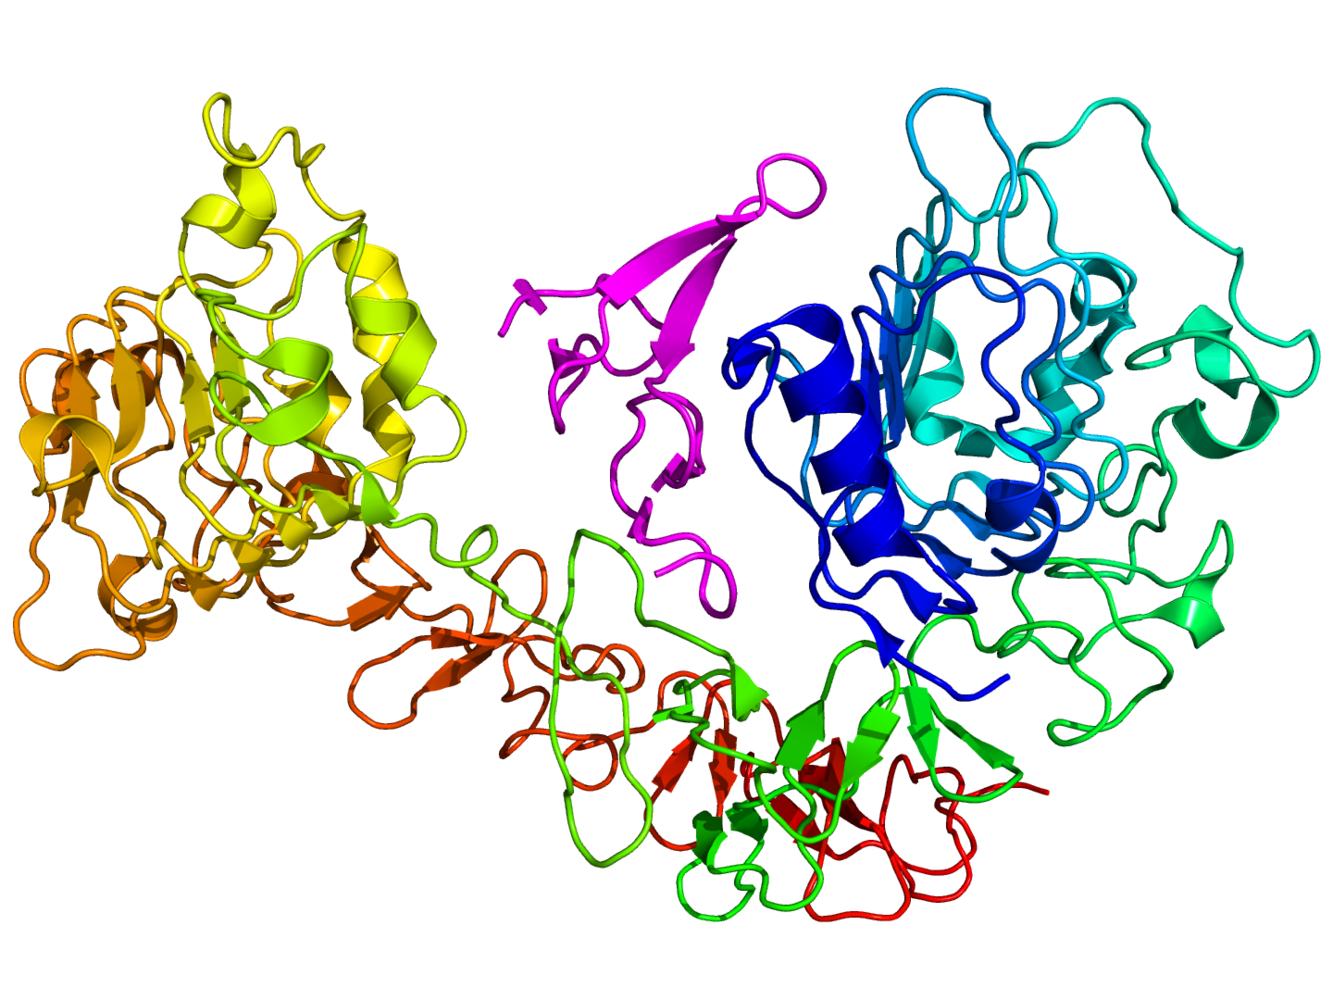 Cartoon diagram of the epidermal growth factor receptor (EGFR) (rainbow colored, N-terminus = blue, C-terminus = red) complexed its ligand epidermal growth factor (magenta) based on the PDB 1NQL crystallographic coordinates.